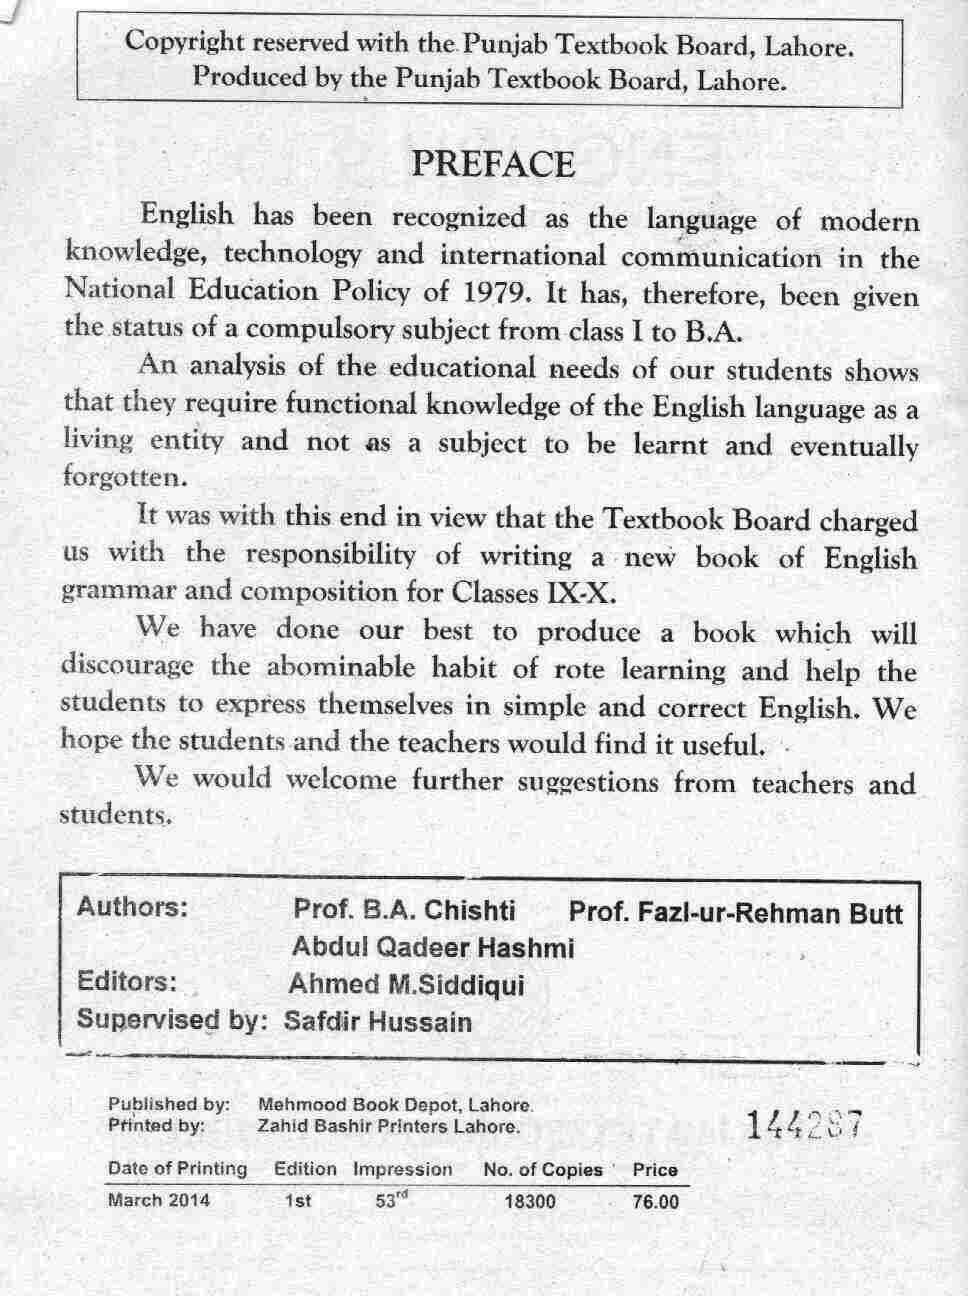 Download 10th Class English Grammar Book Pdf Free - softguru-softhr